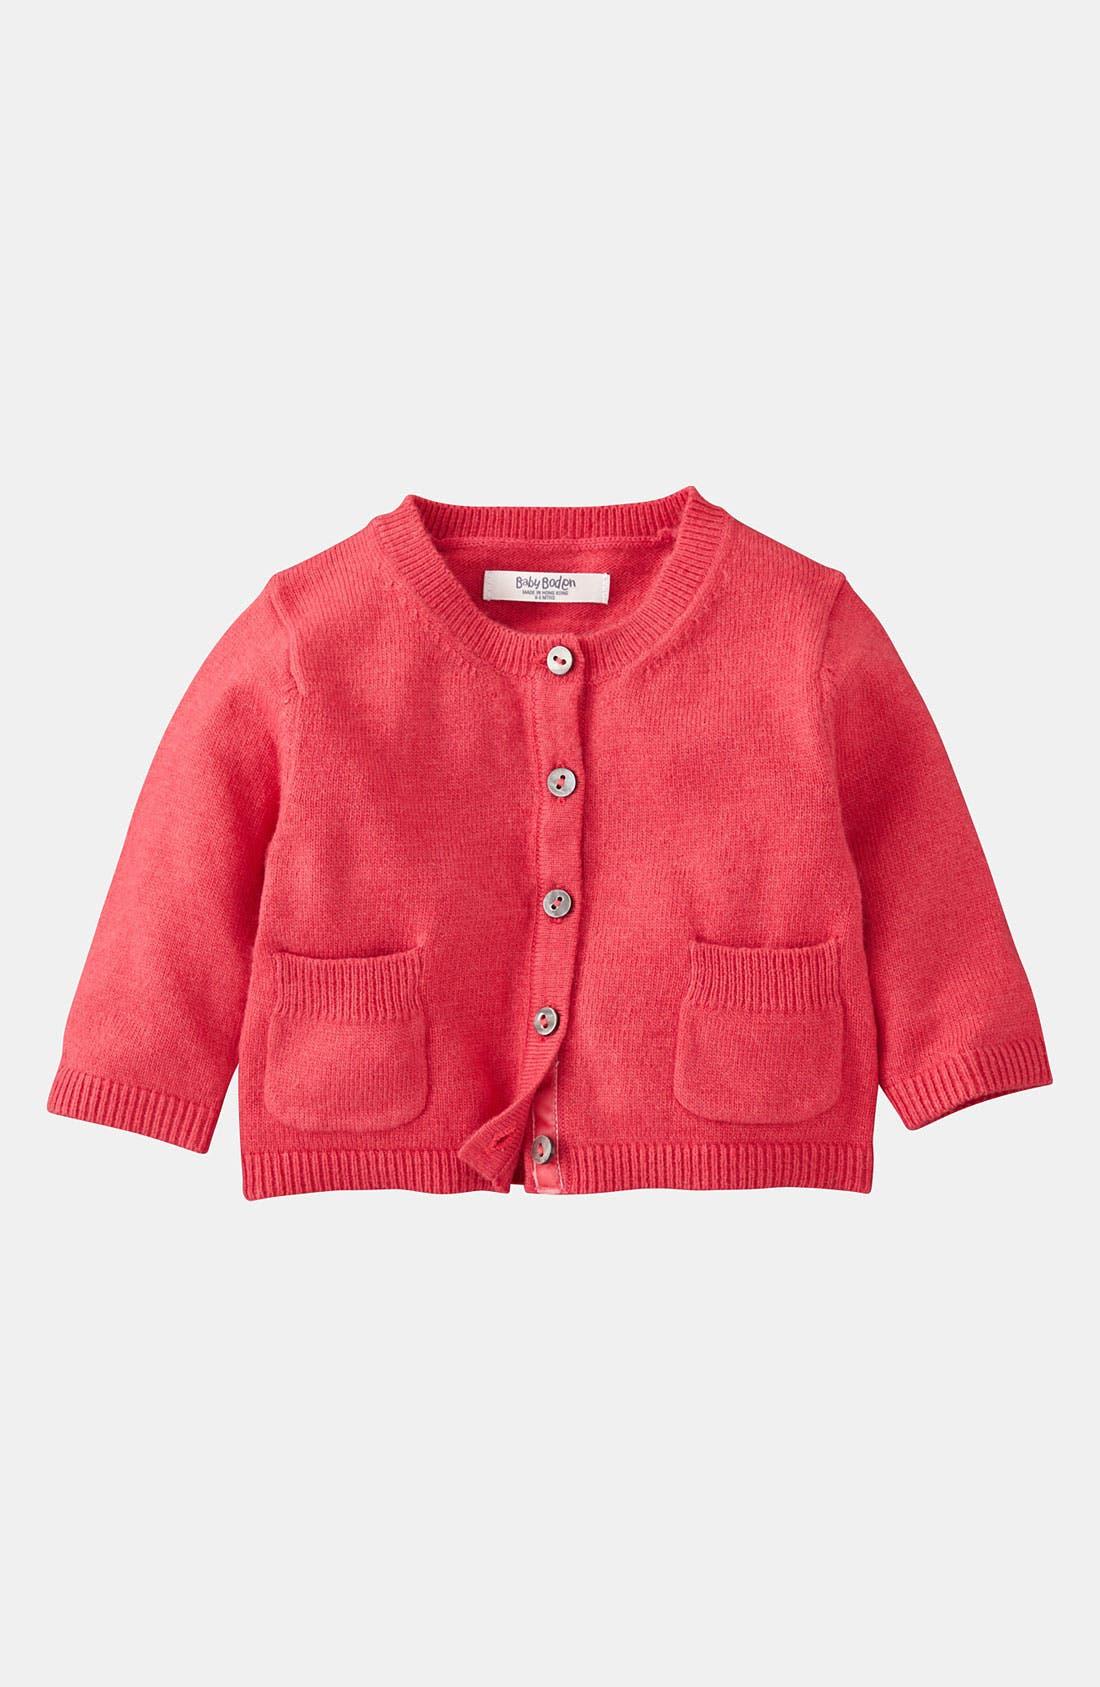 Main Image - Mini Boden 'Baby' Cardigan (Infant)